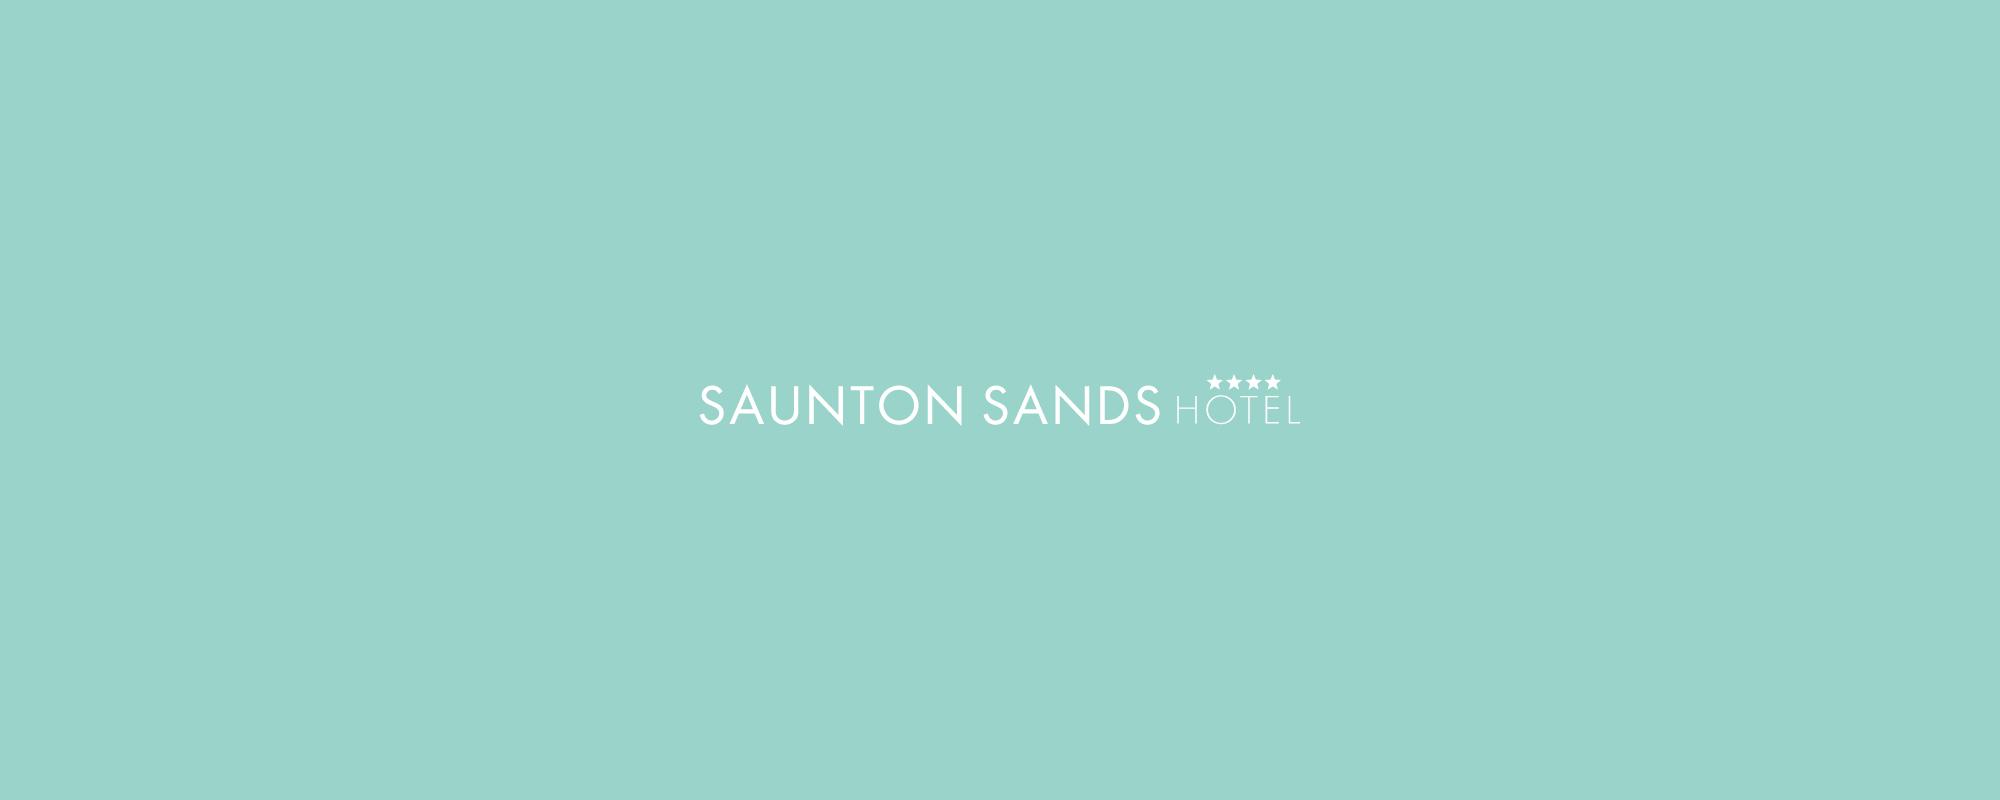 Saunton Sands Cover Image.jpg